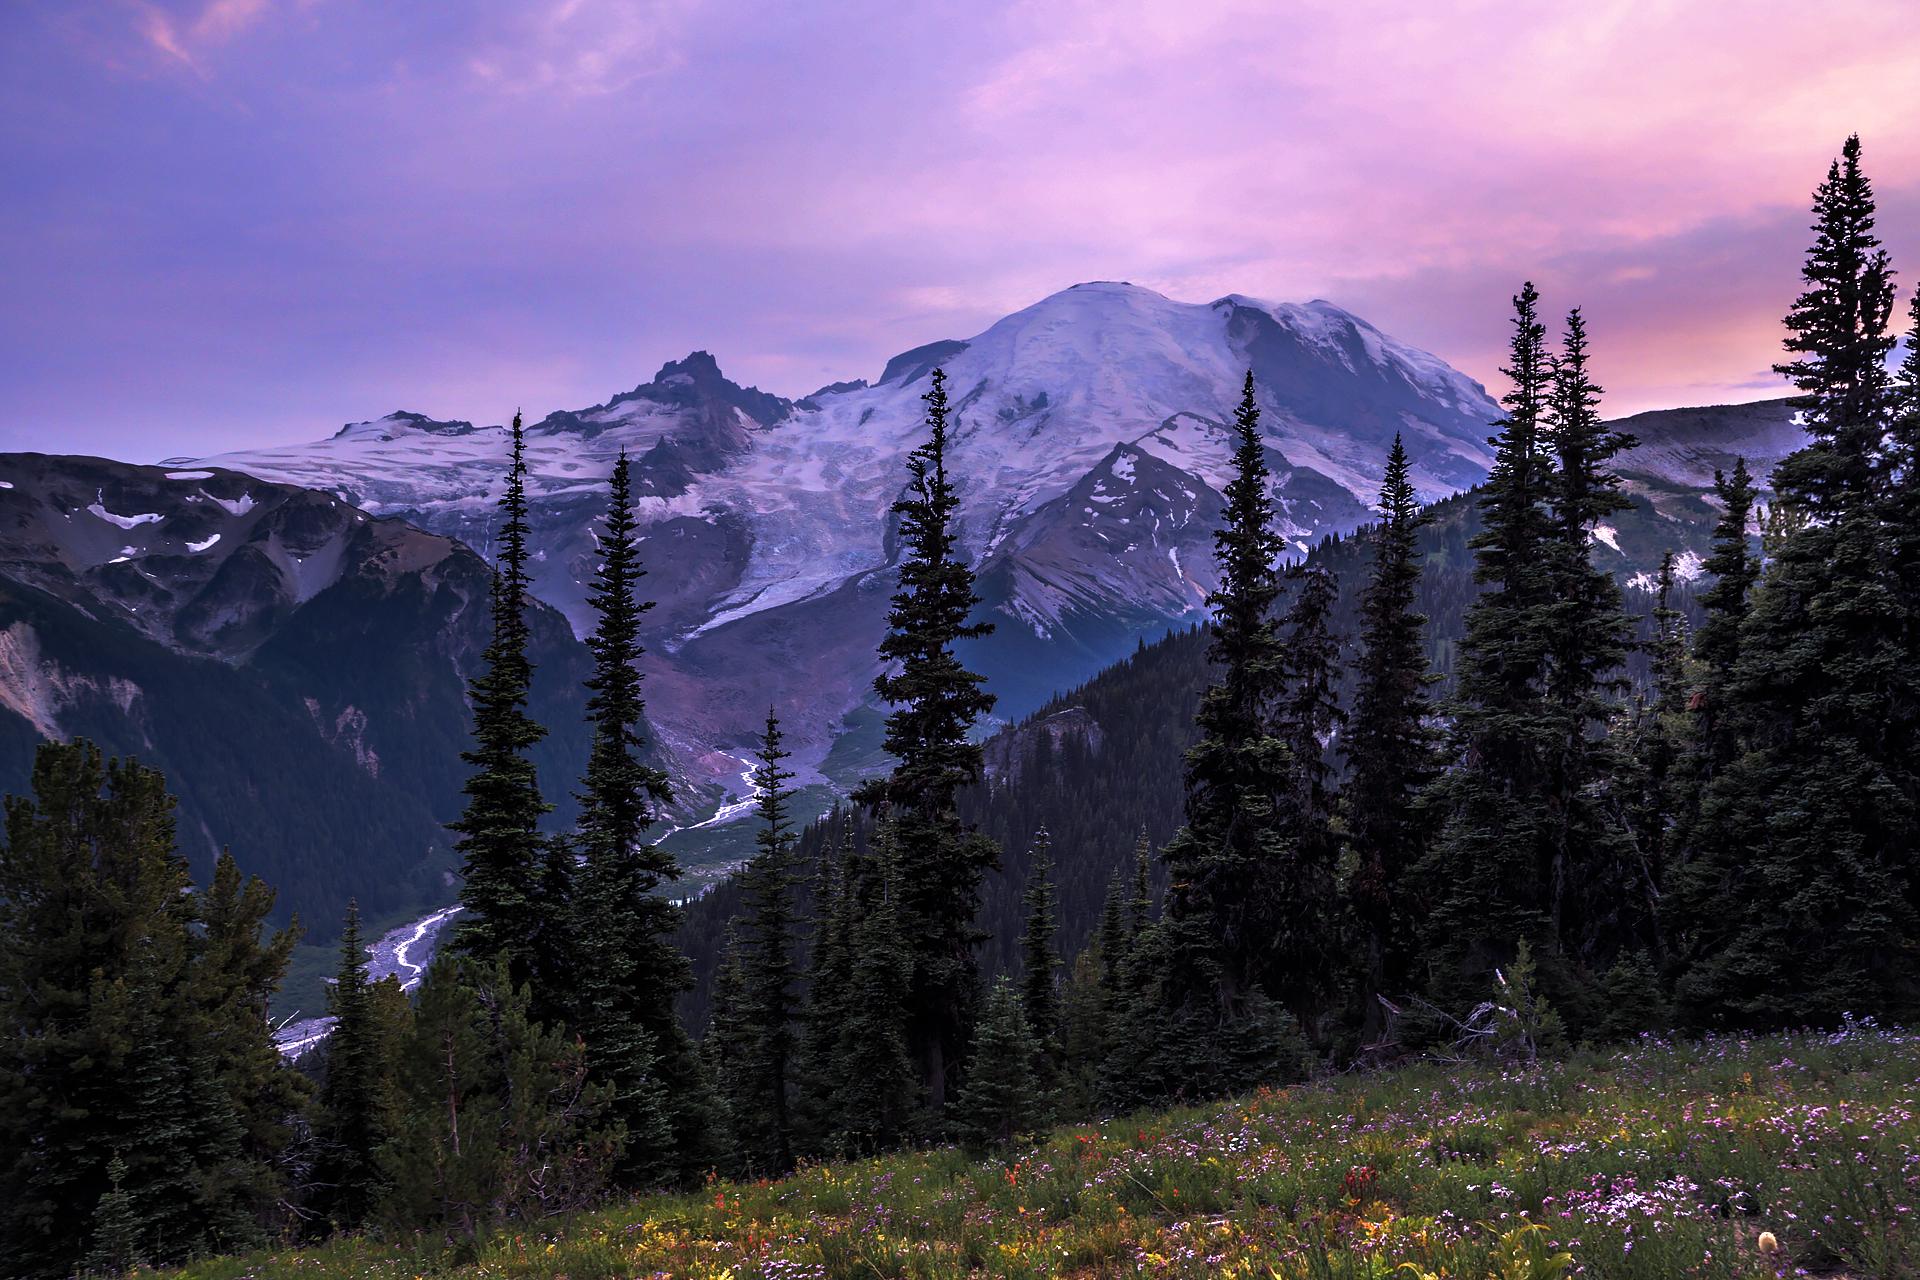 20130822-Rainier-Day-2---Sunrise-1193.jpg